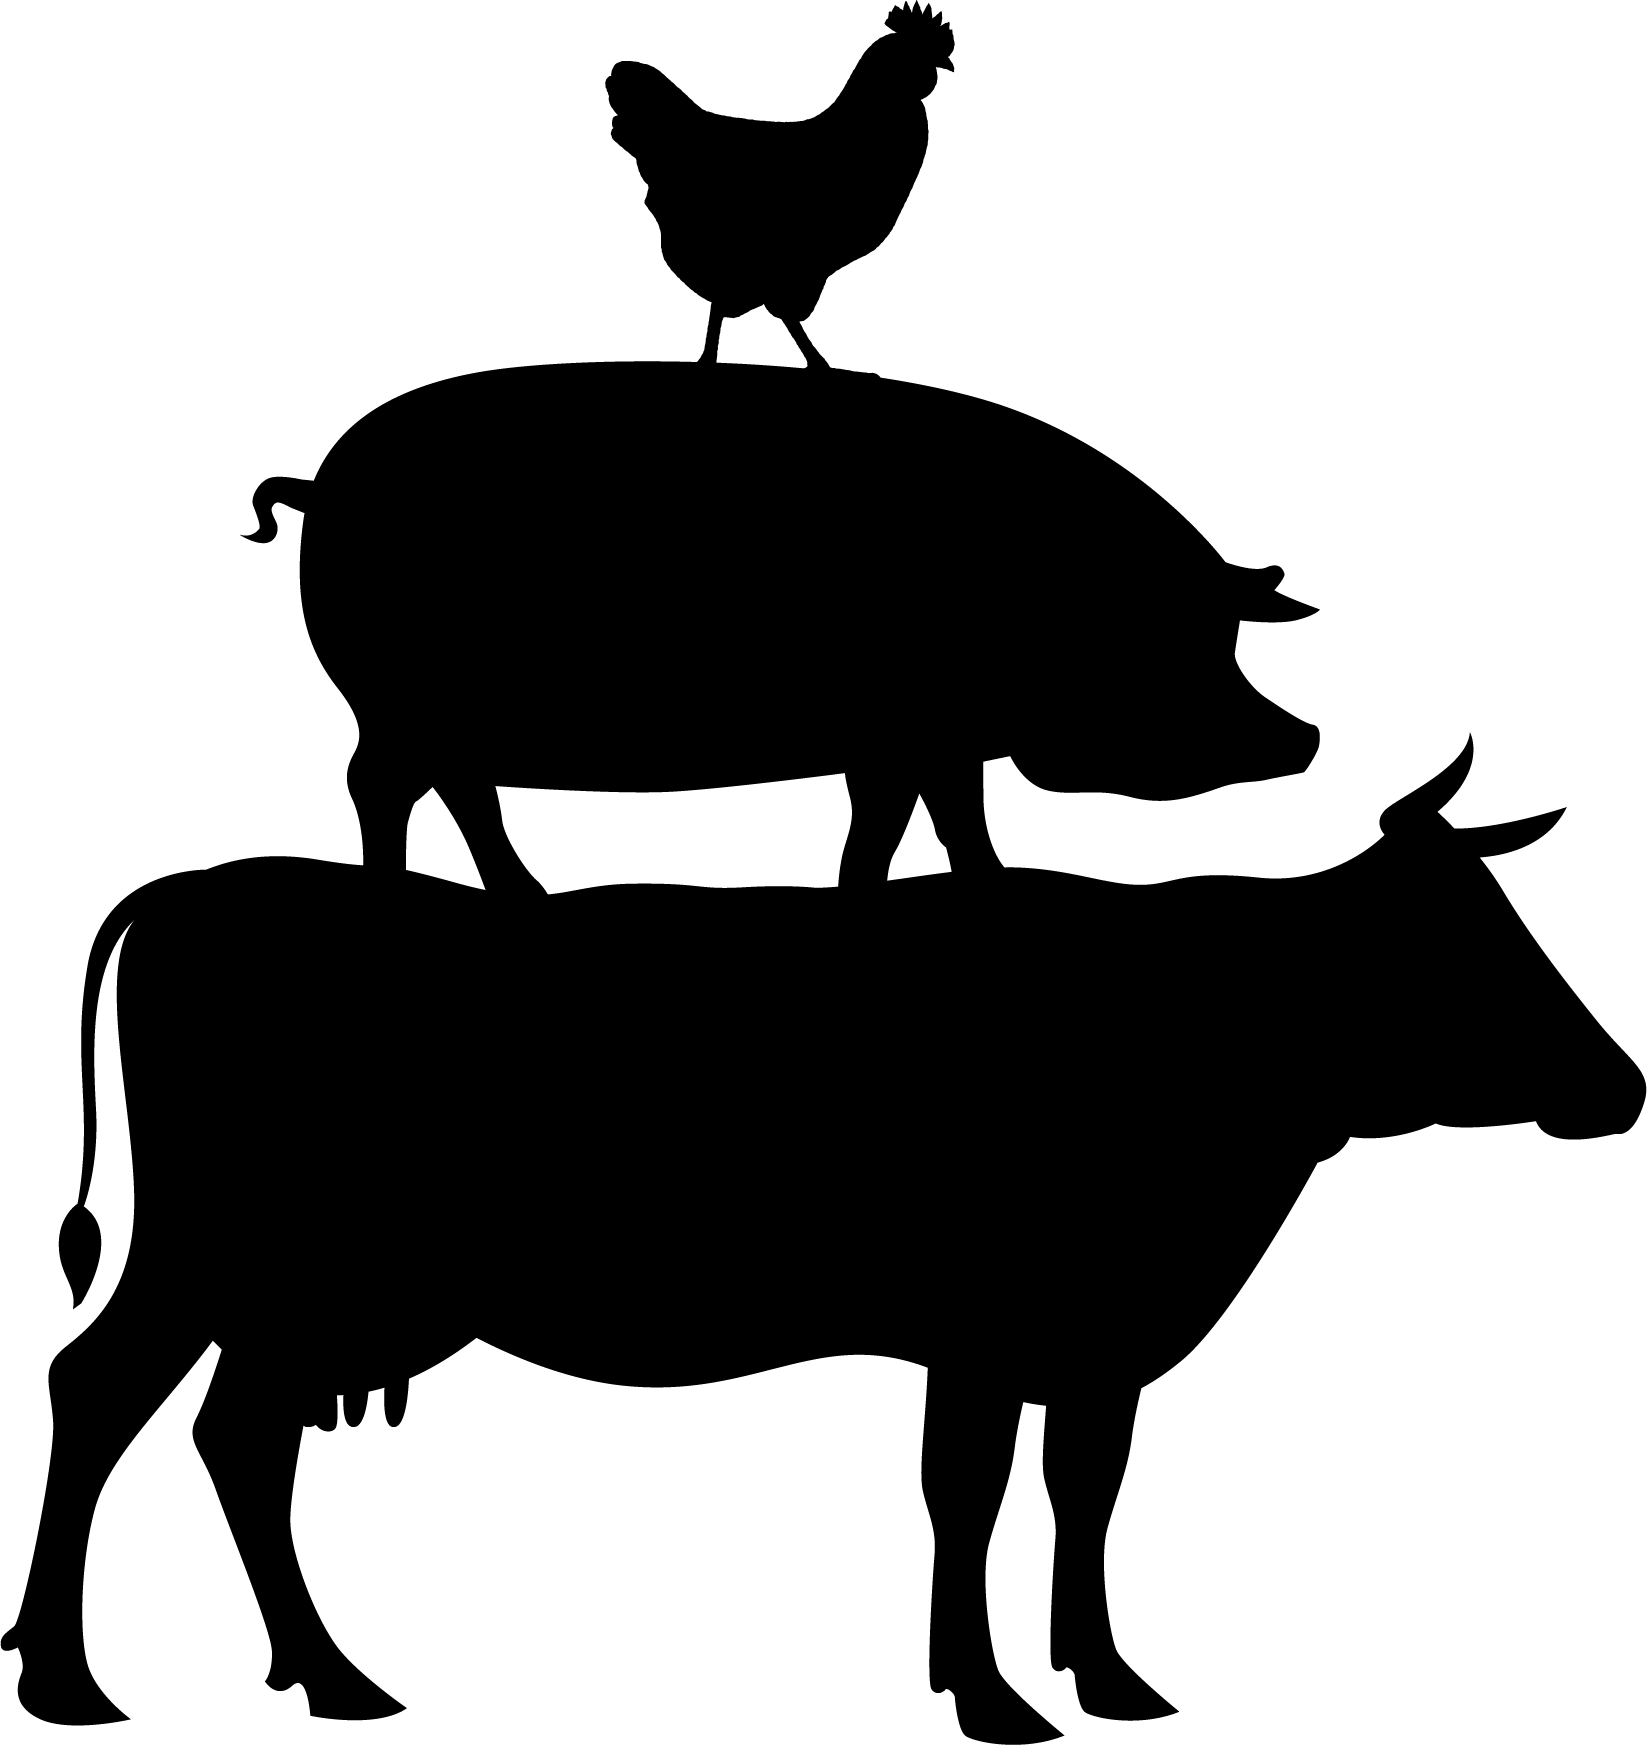 ANIMALS NO PATTERN.png